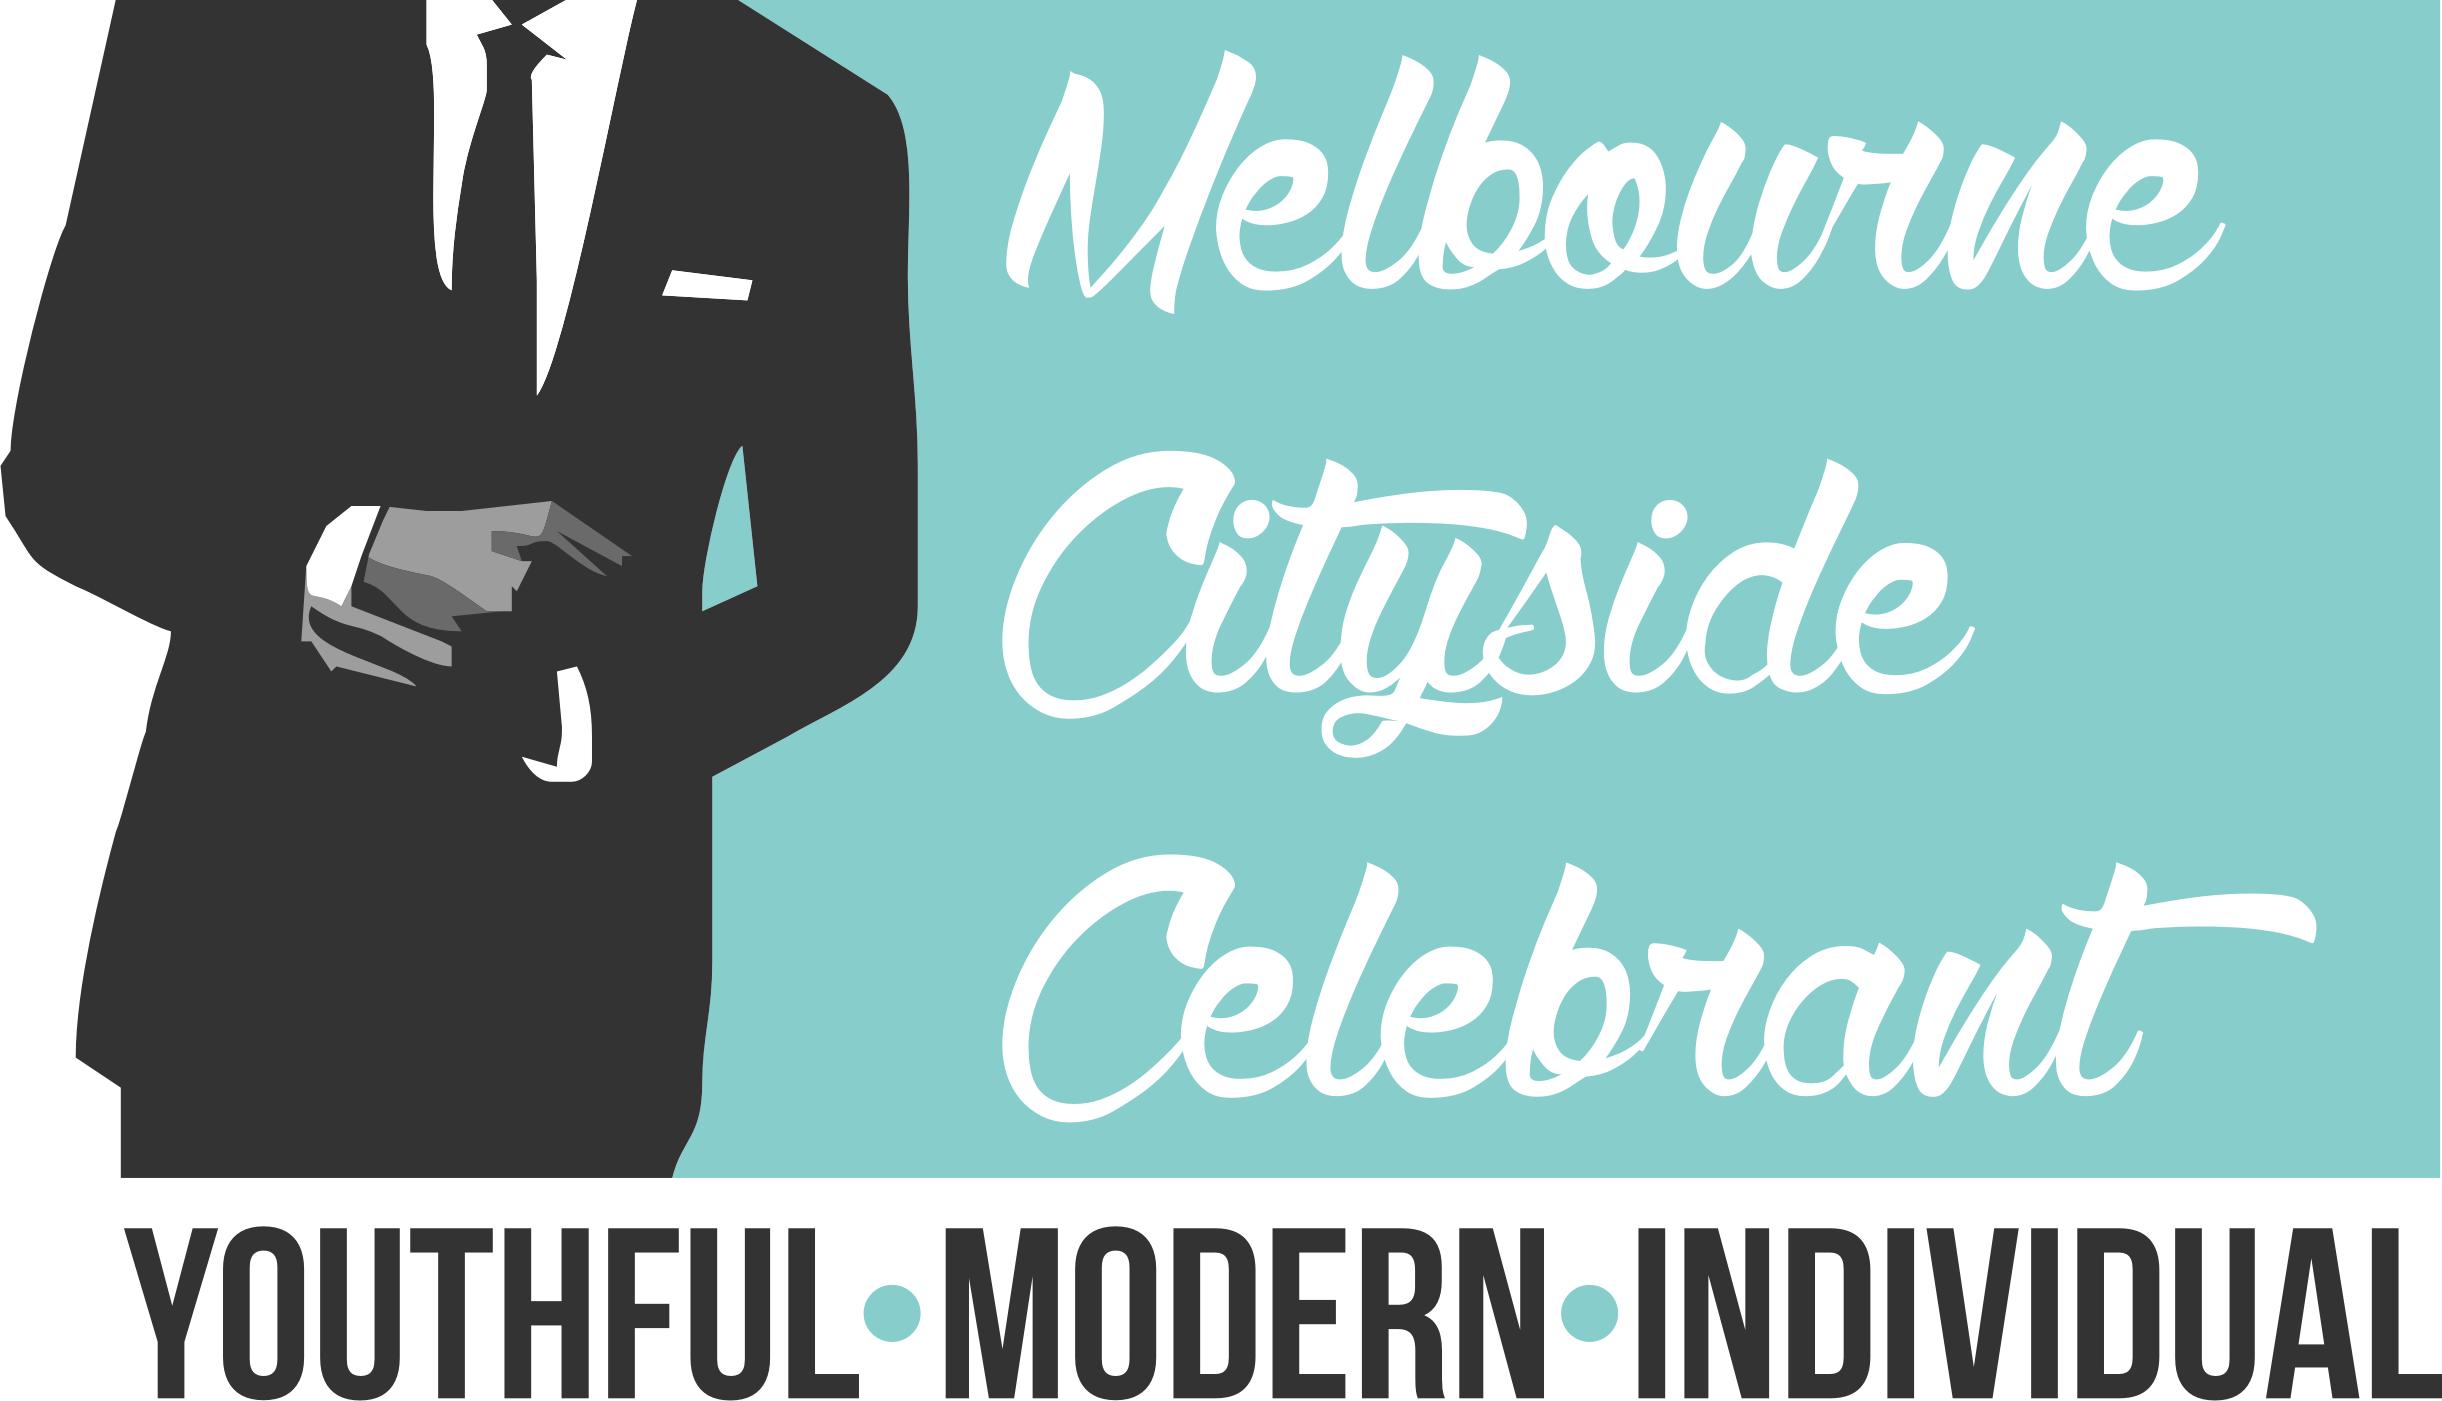 Melbourne Cityside Celebrant Logo.png